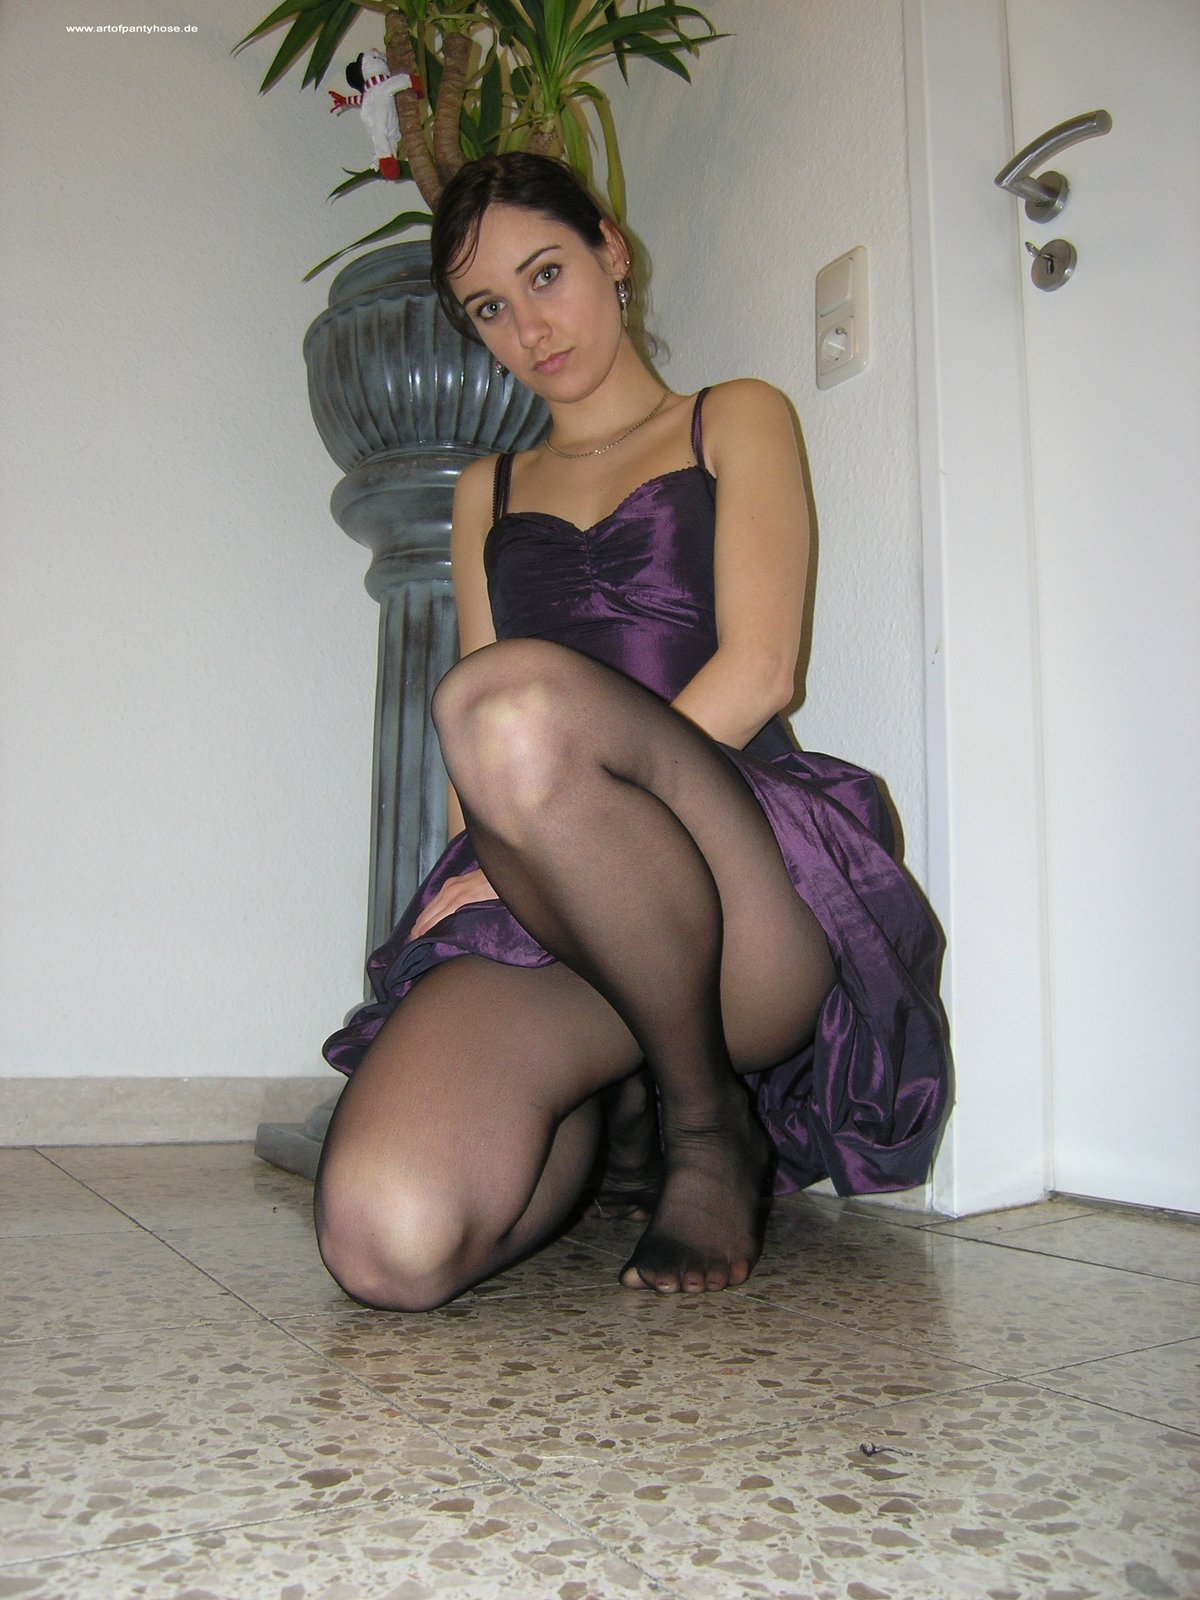 Feet, Legs, Nylon Syxe Legs In Phose-3729